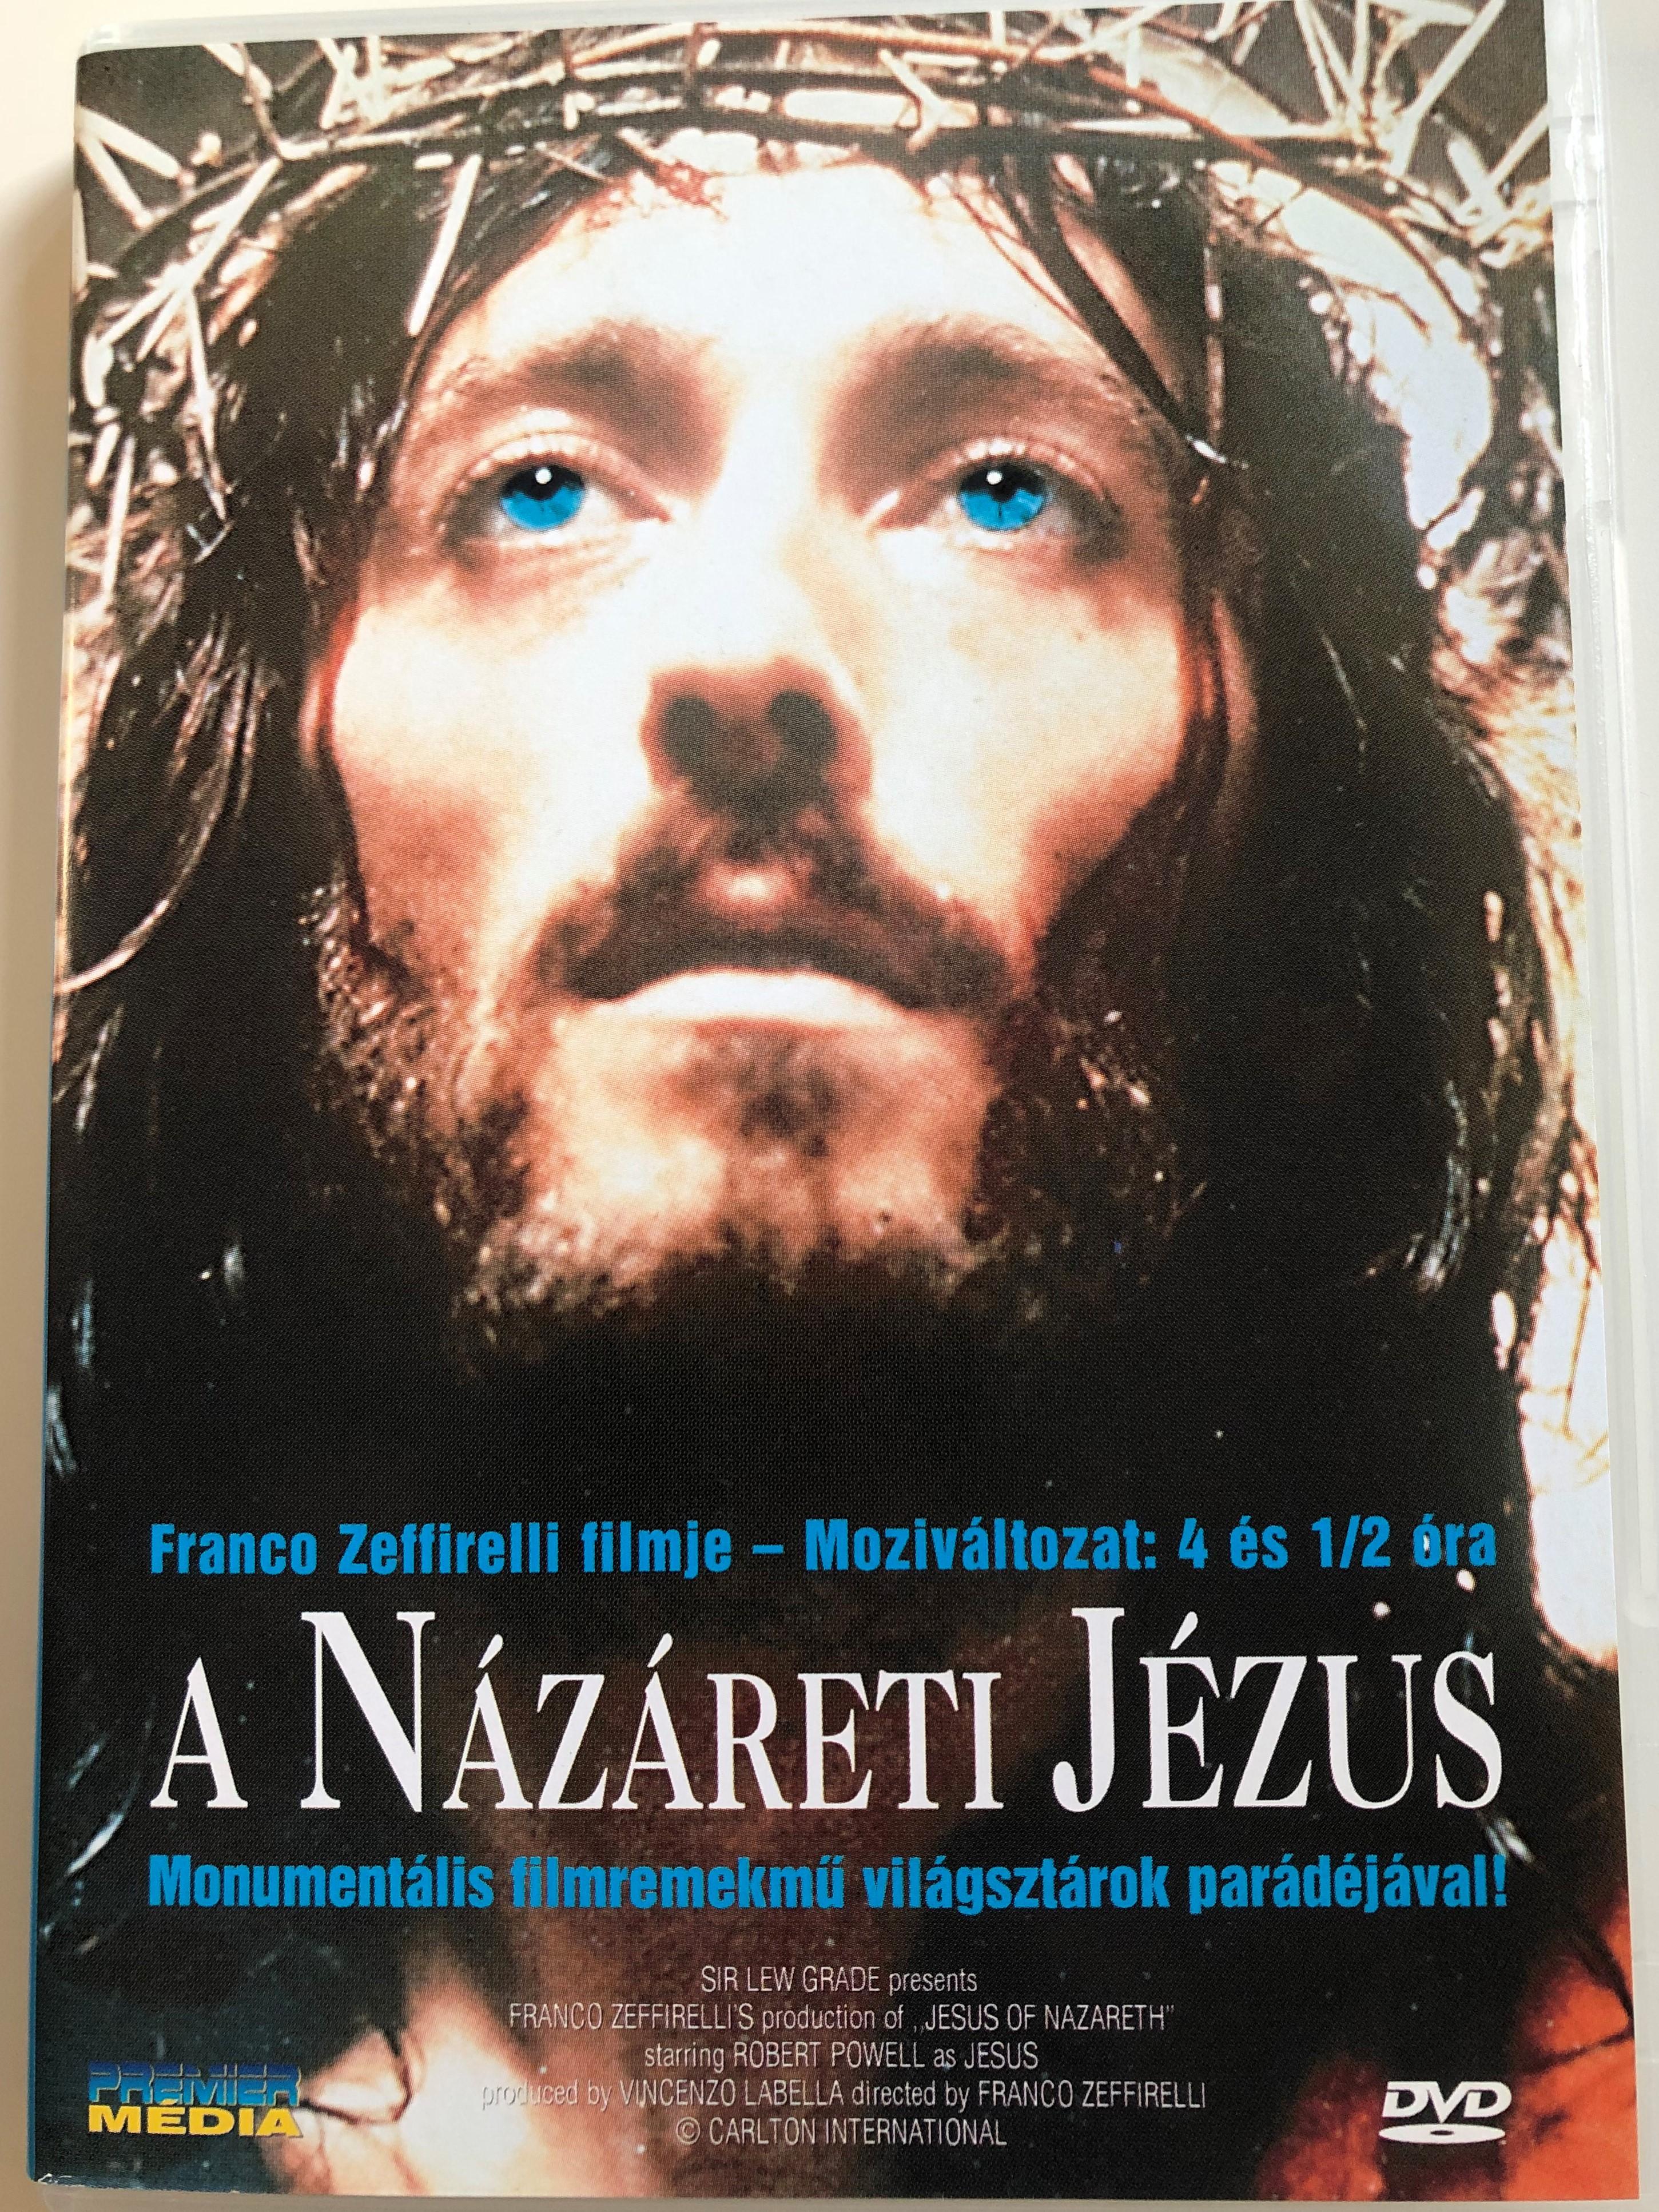 jesus-of-nazareth-dvd-1977-a-n-z-reti-j-zus-directed-by-franco-zeffirelli-1.jpg